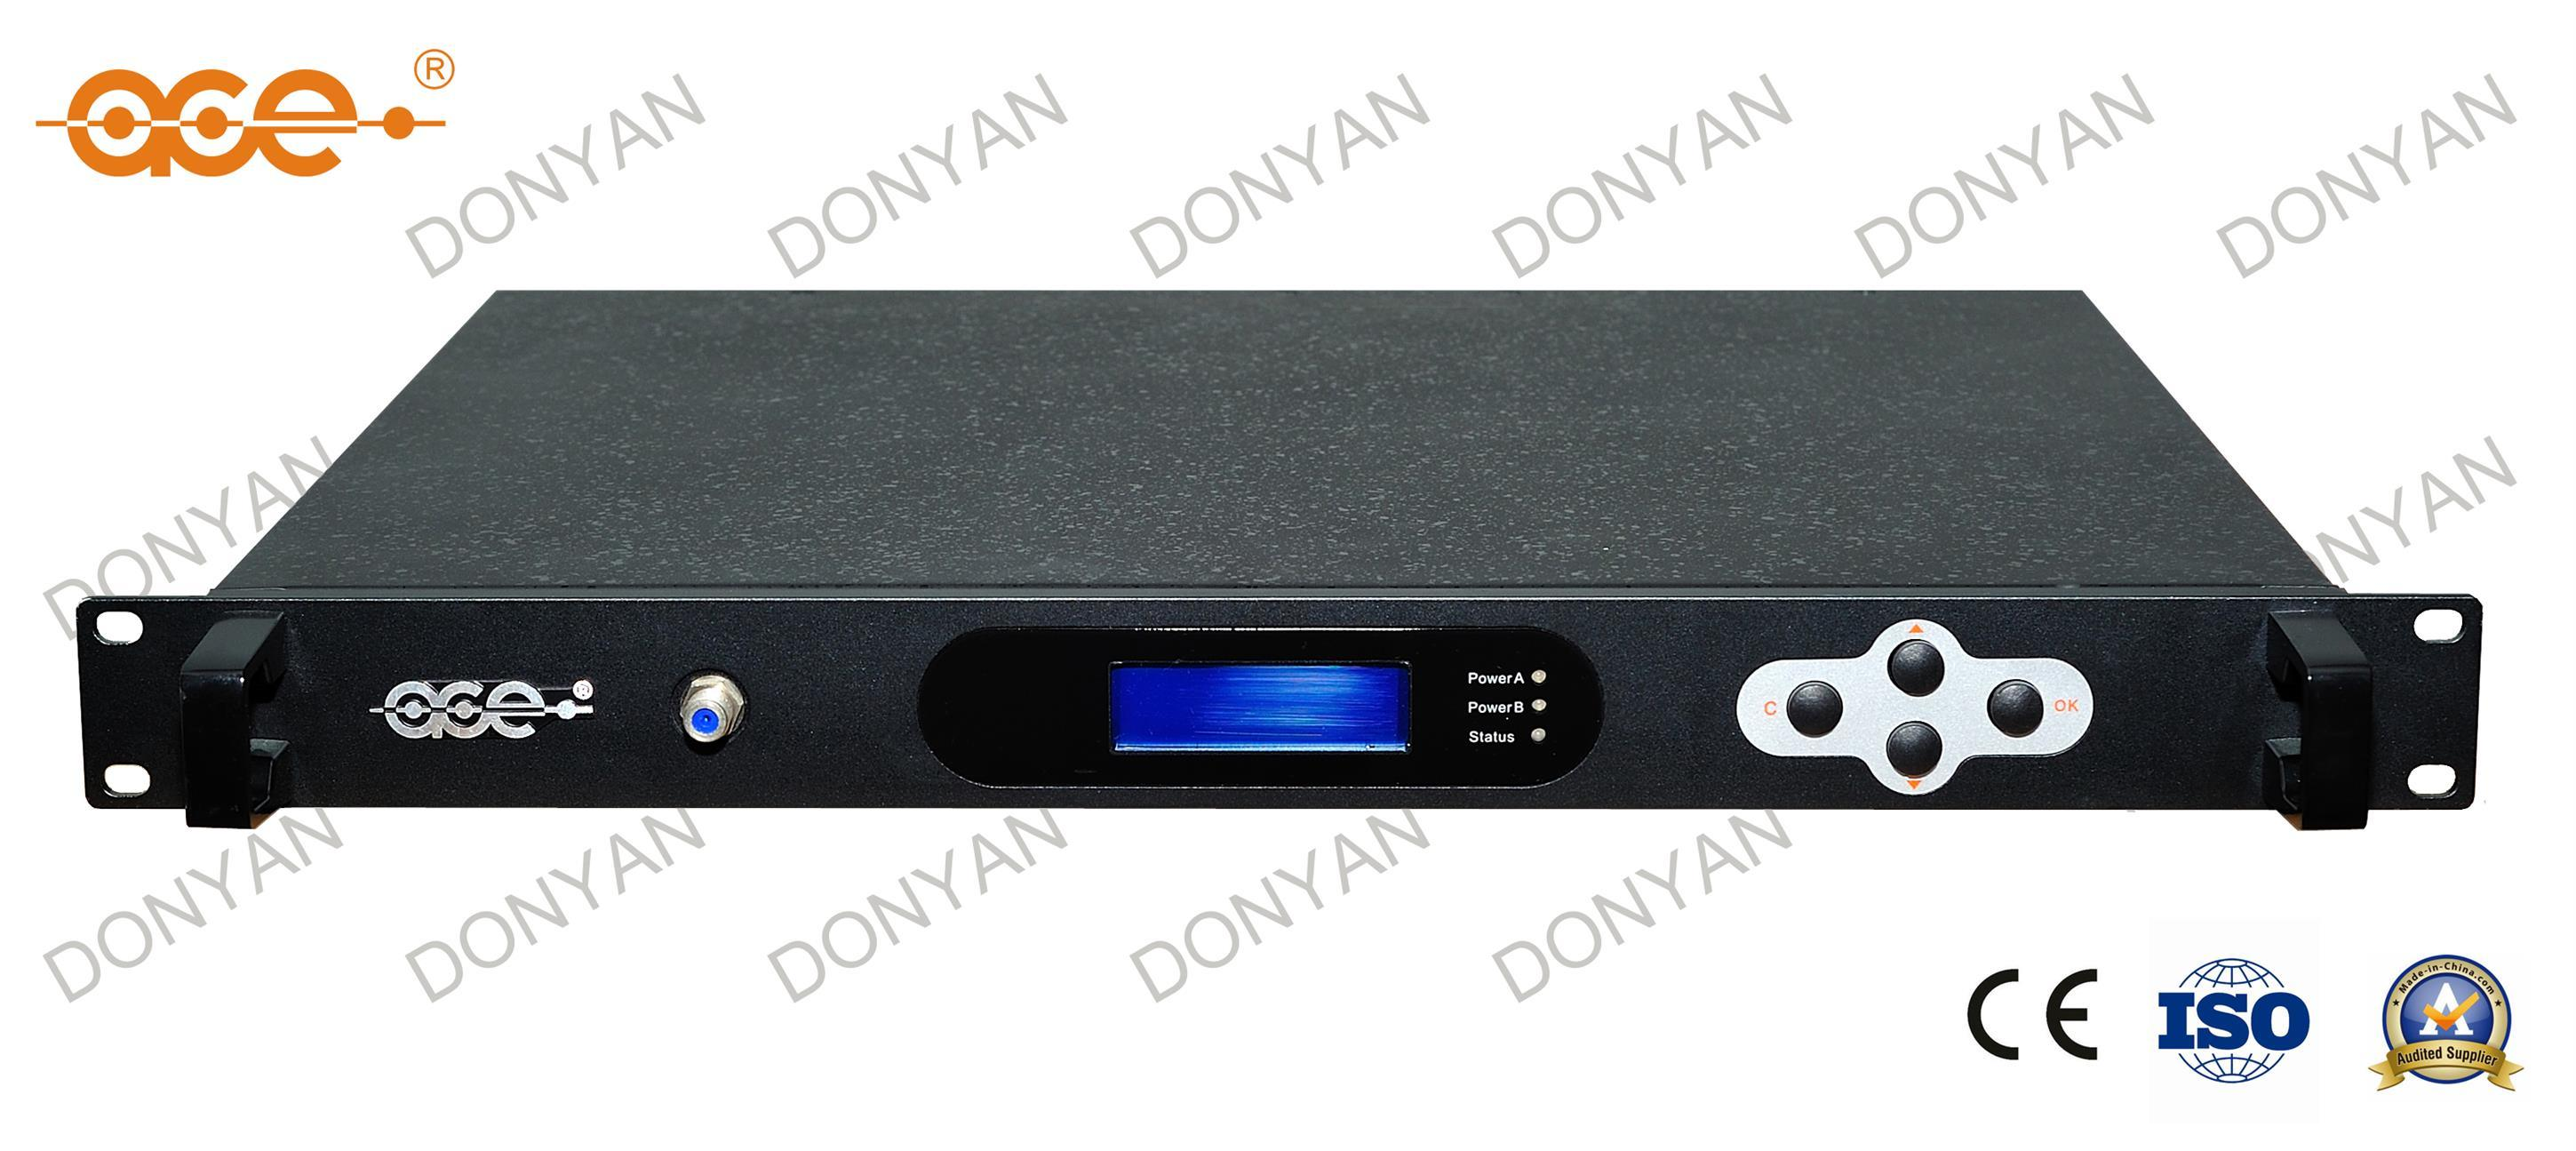 Aot1550-02-41 Ace 1550nm CATV Signal Amplifier EDFA